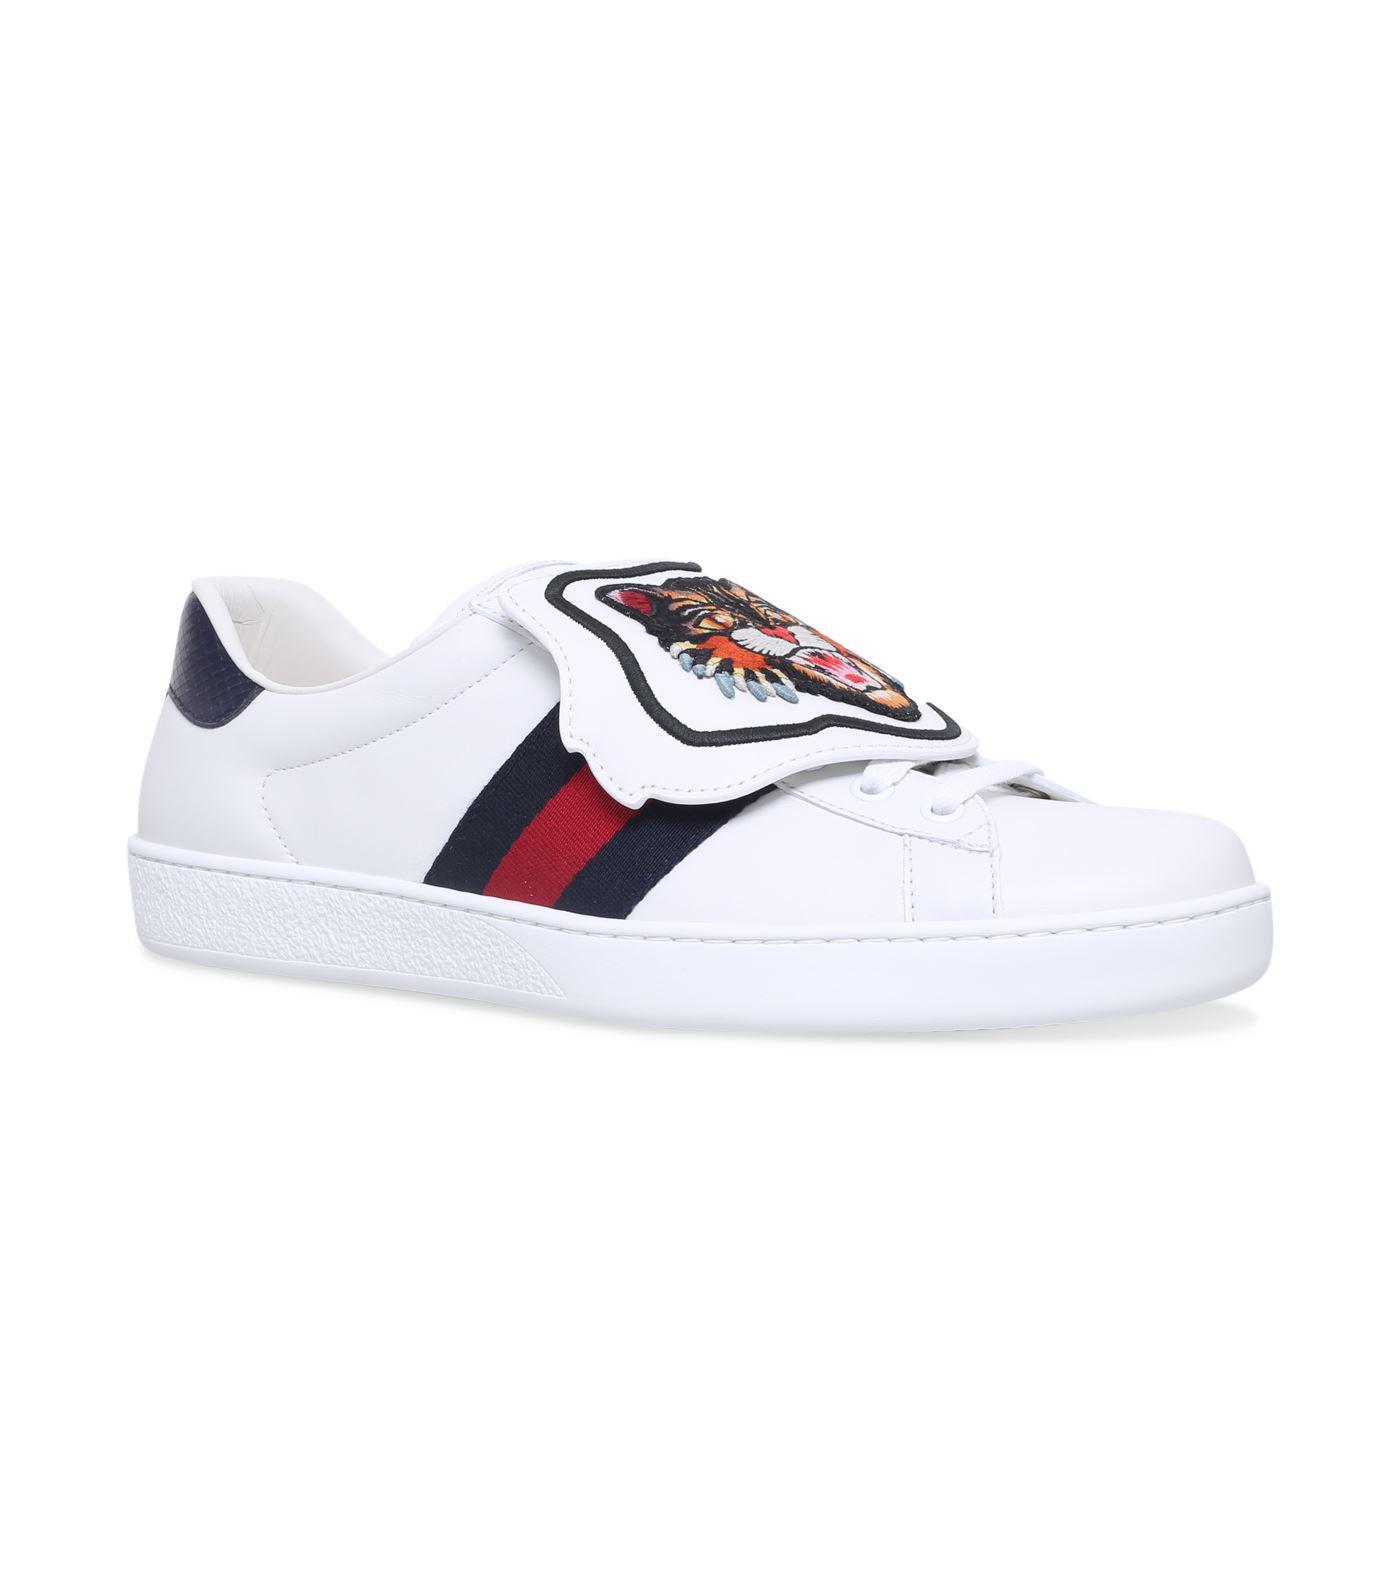 Sneaker ACE Kalbsleder Gucci Webdetails Logo Patch wei? Gucci TezENv8tW